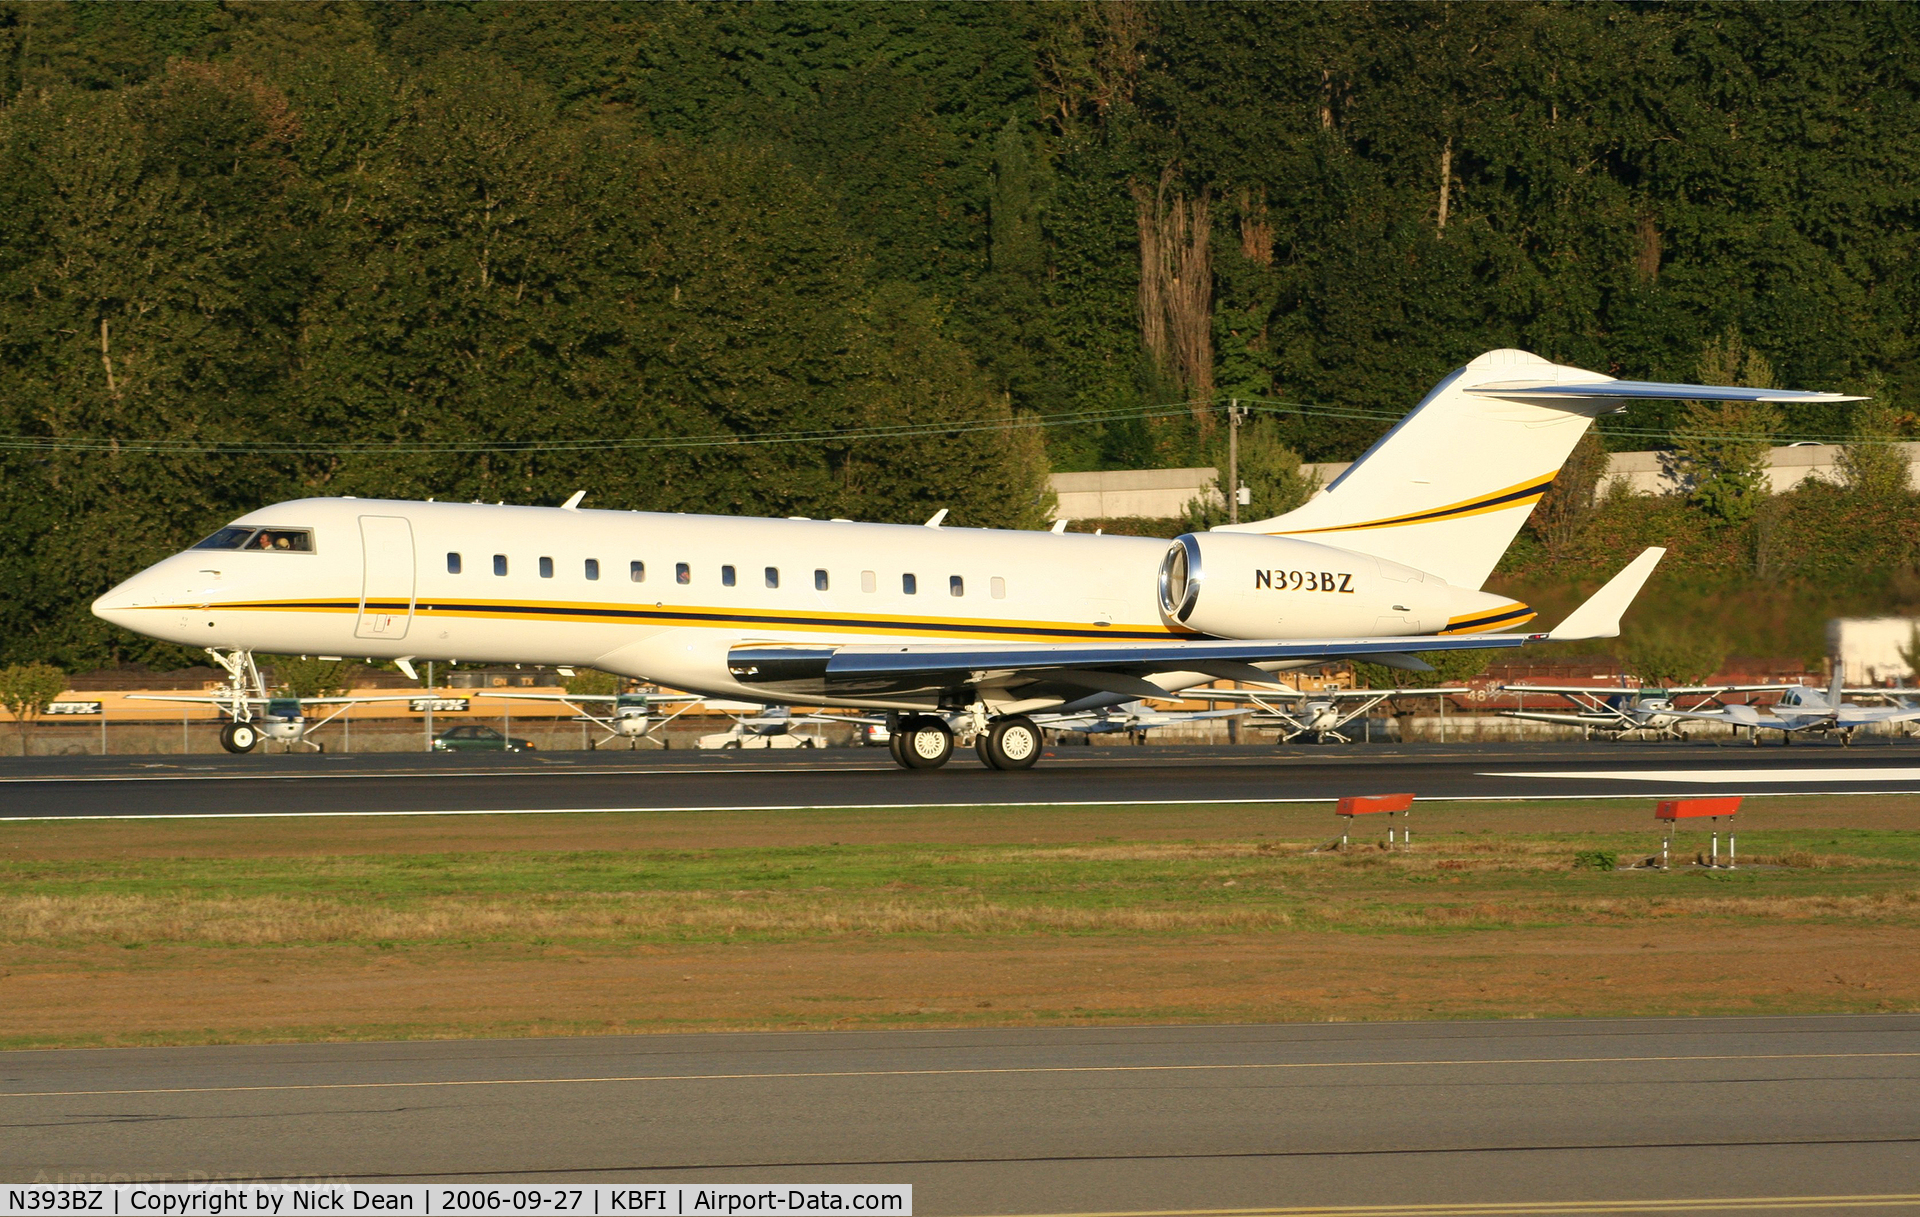 N393BZ, 1999 Bombardier BD-700-1A10 Global Express C/N 9022, KBFI